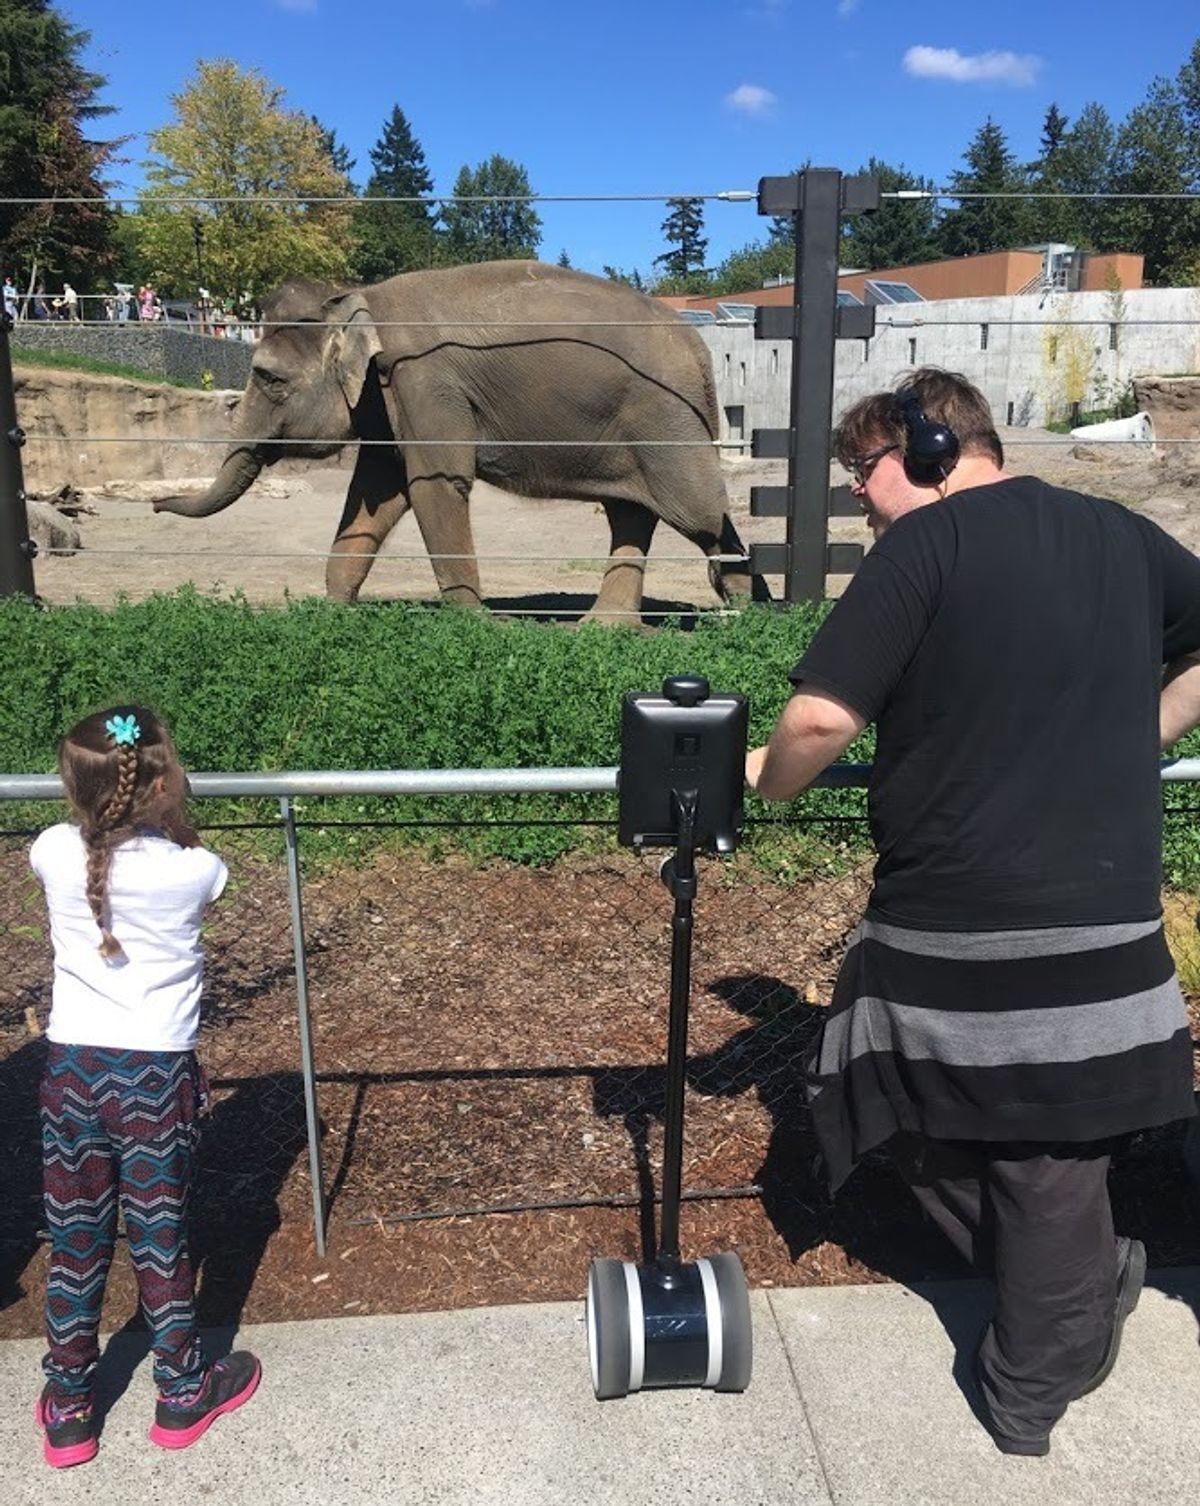 Double 2 telepresence robot at the Oregon Zoo